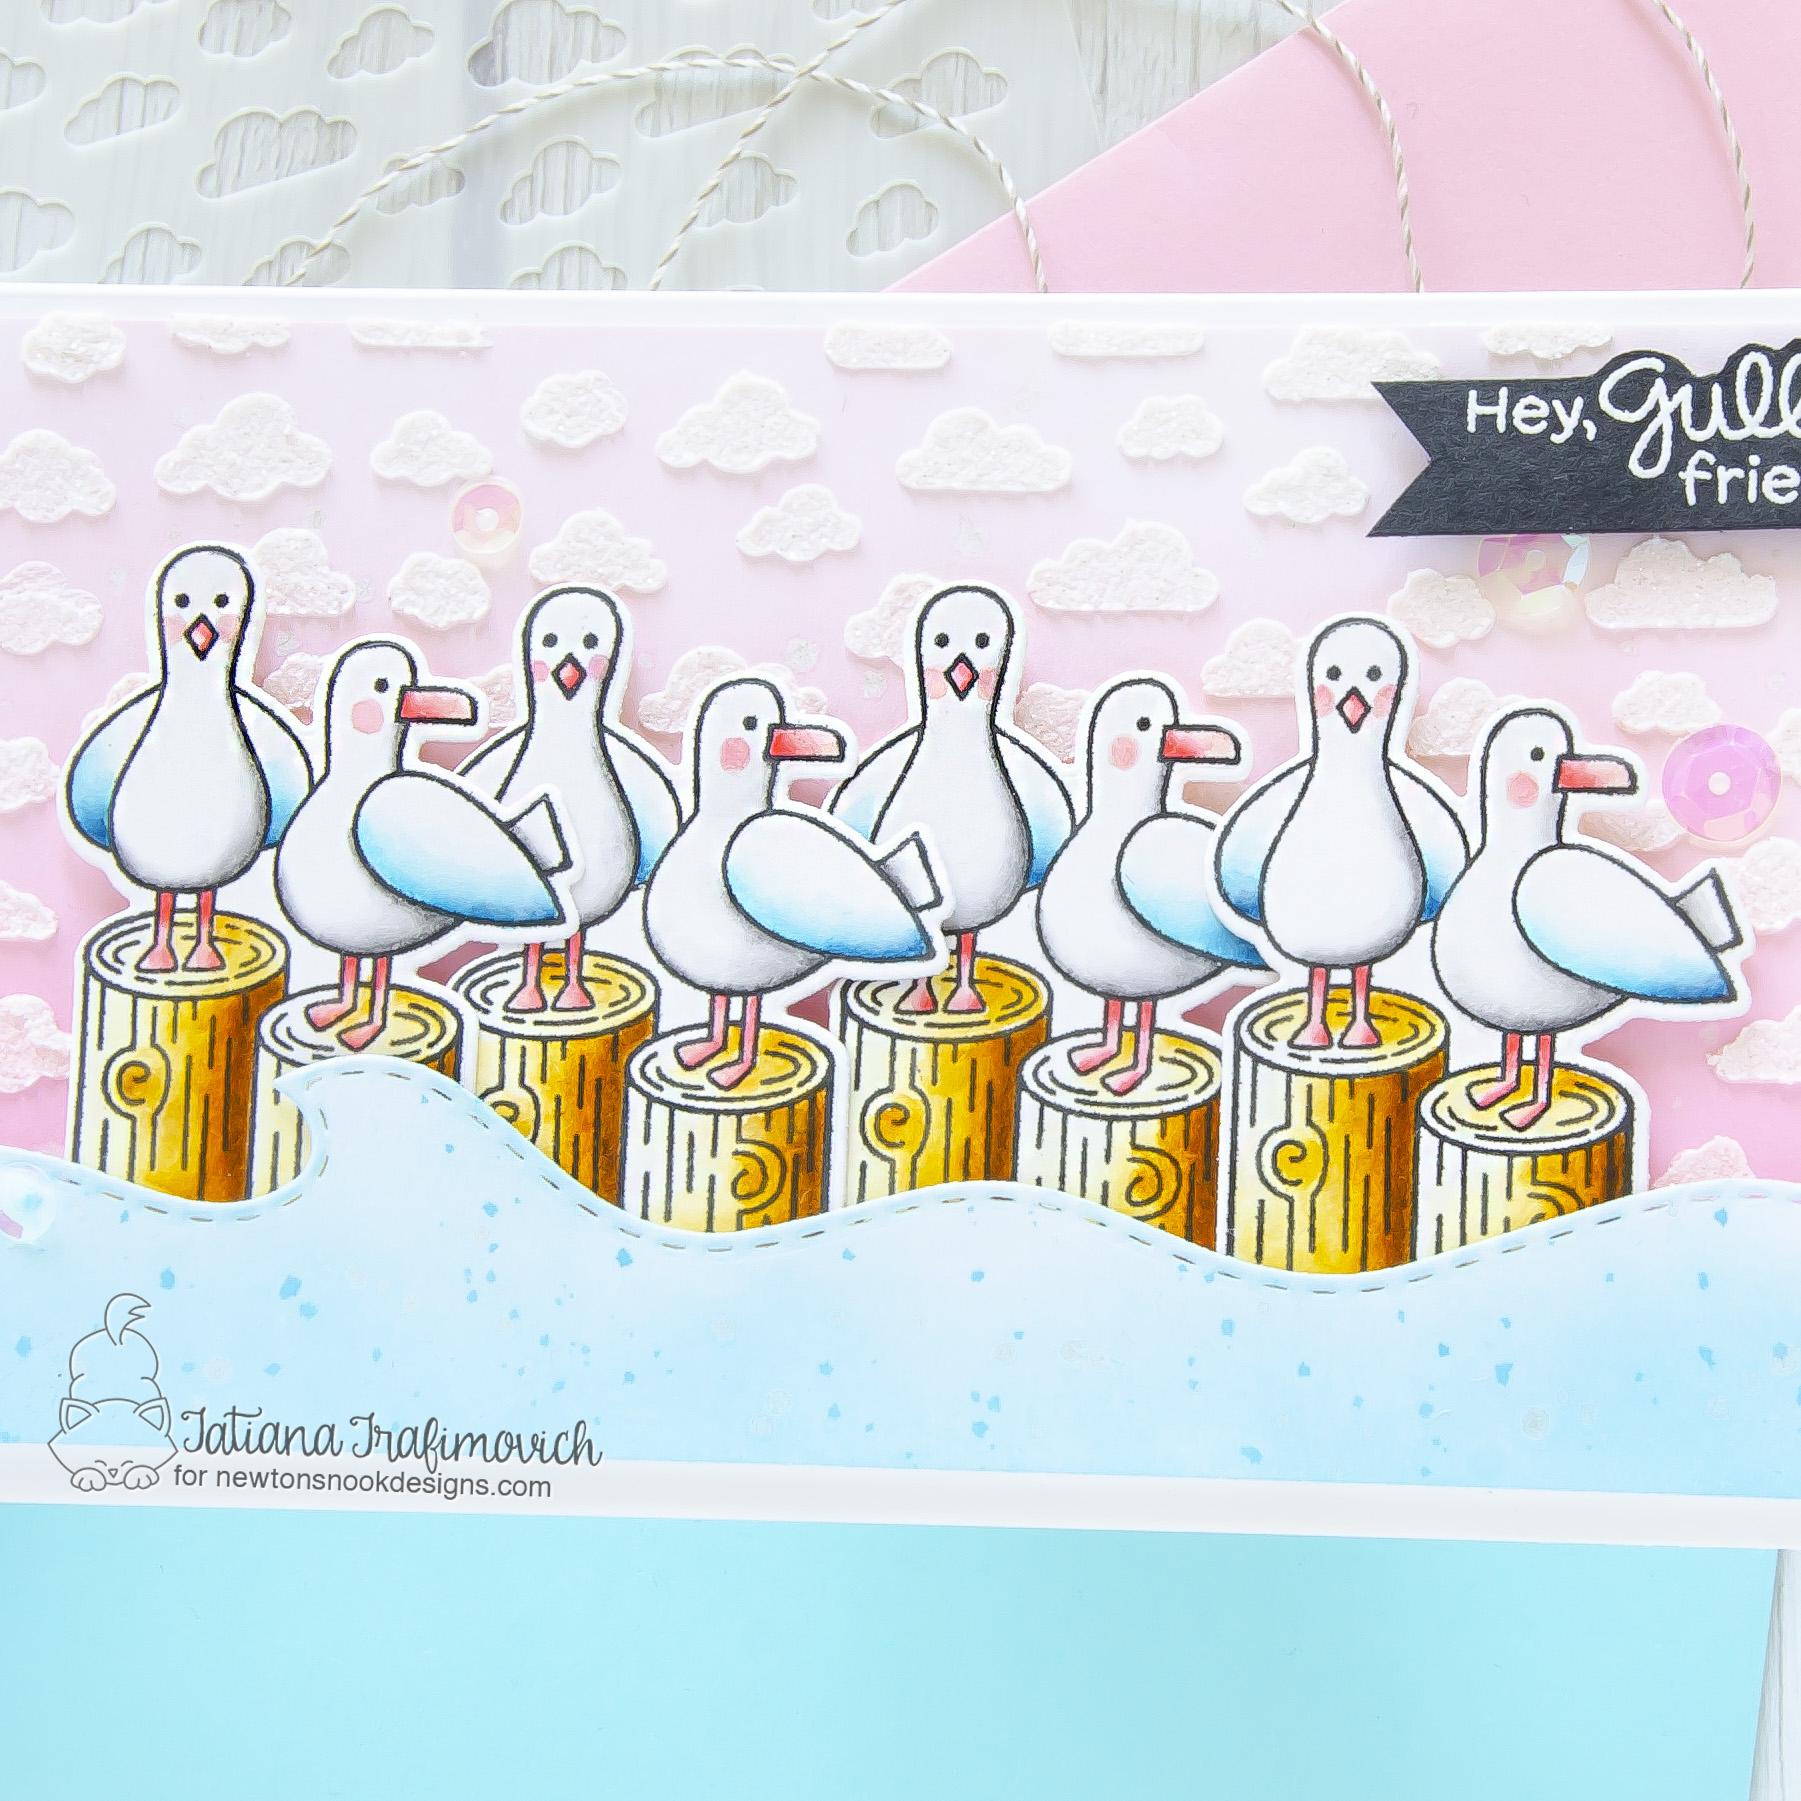 Hey, Gull Friend! #handmade card by Tatiana Trafimovich #tatianacraftandart - Gull Friends stamp set by Newton's Nook Designs #newtonsnook